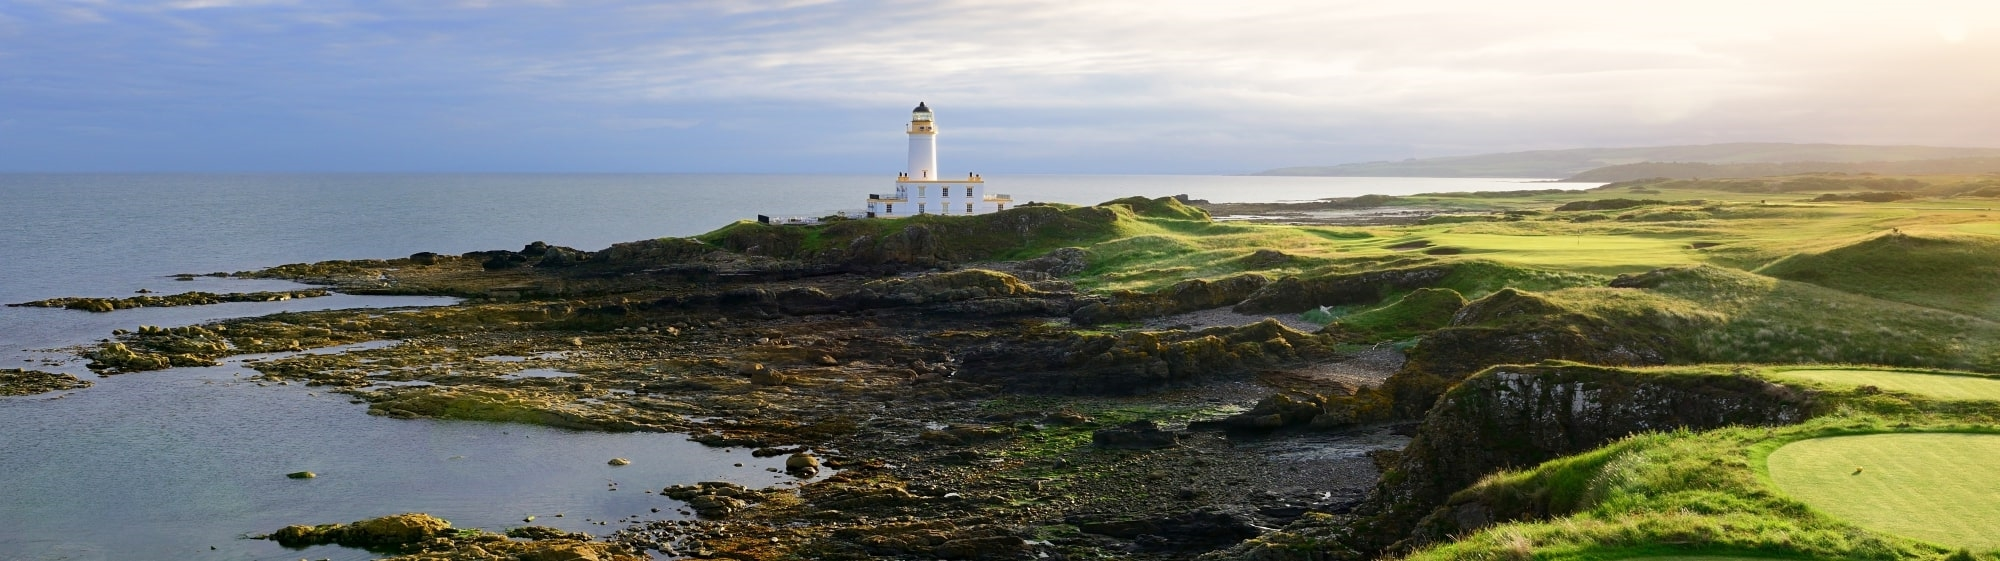 2019 scotland golf tour